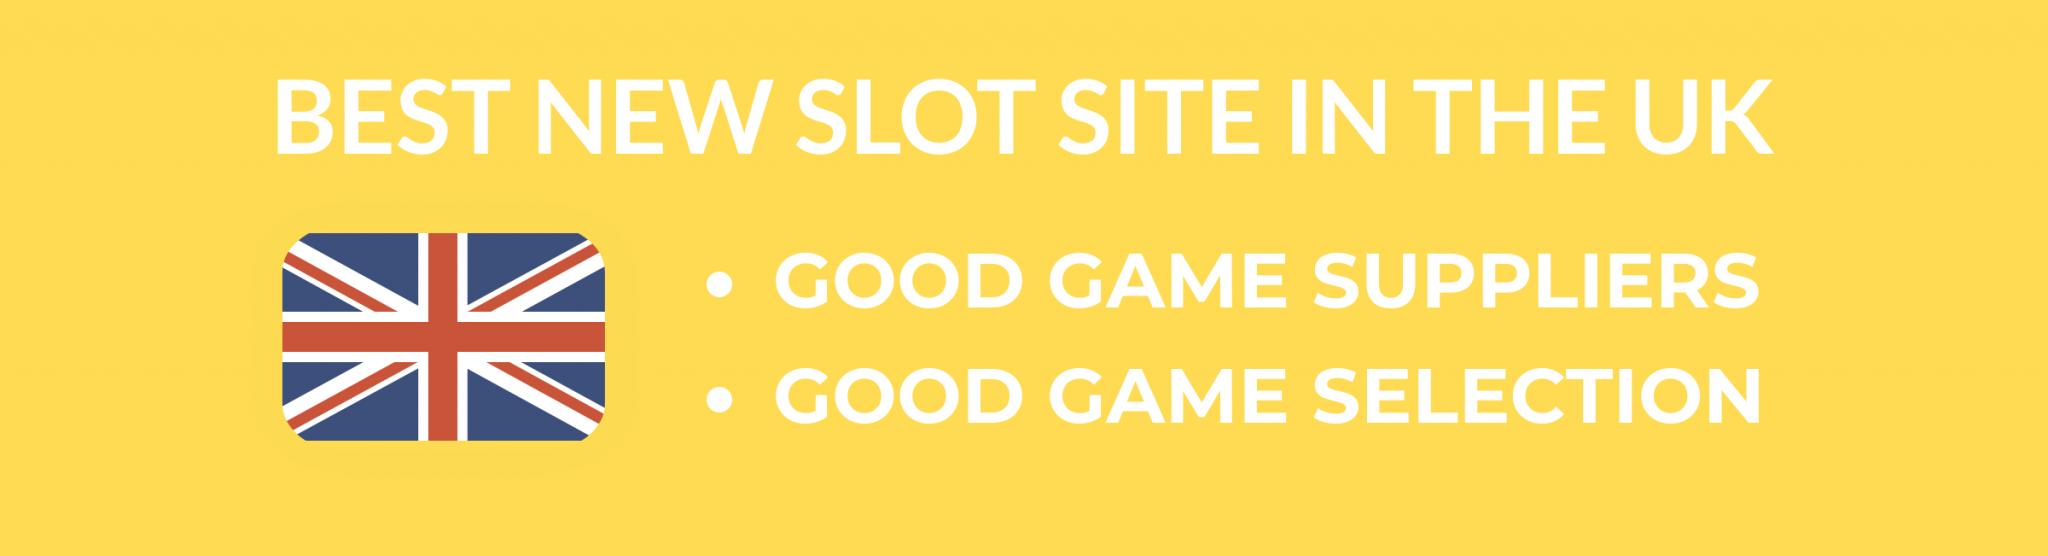 best new slot site uk